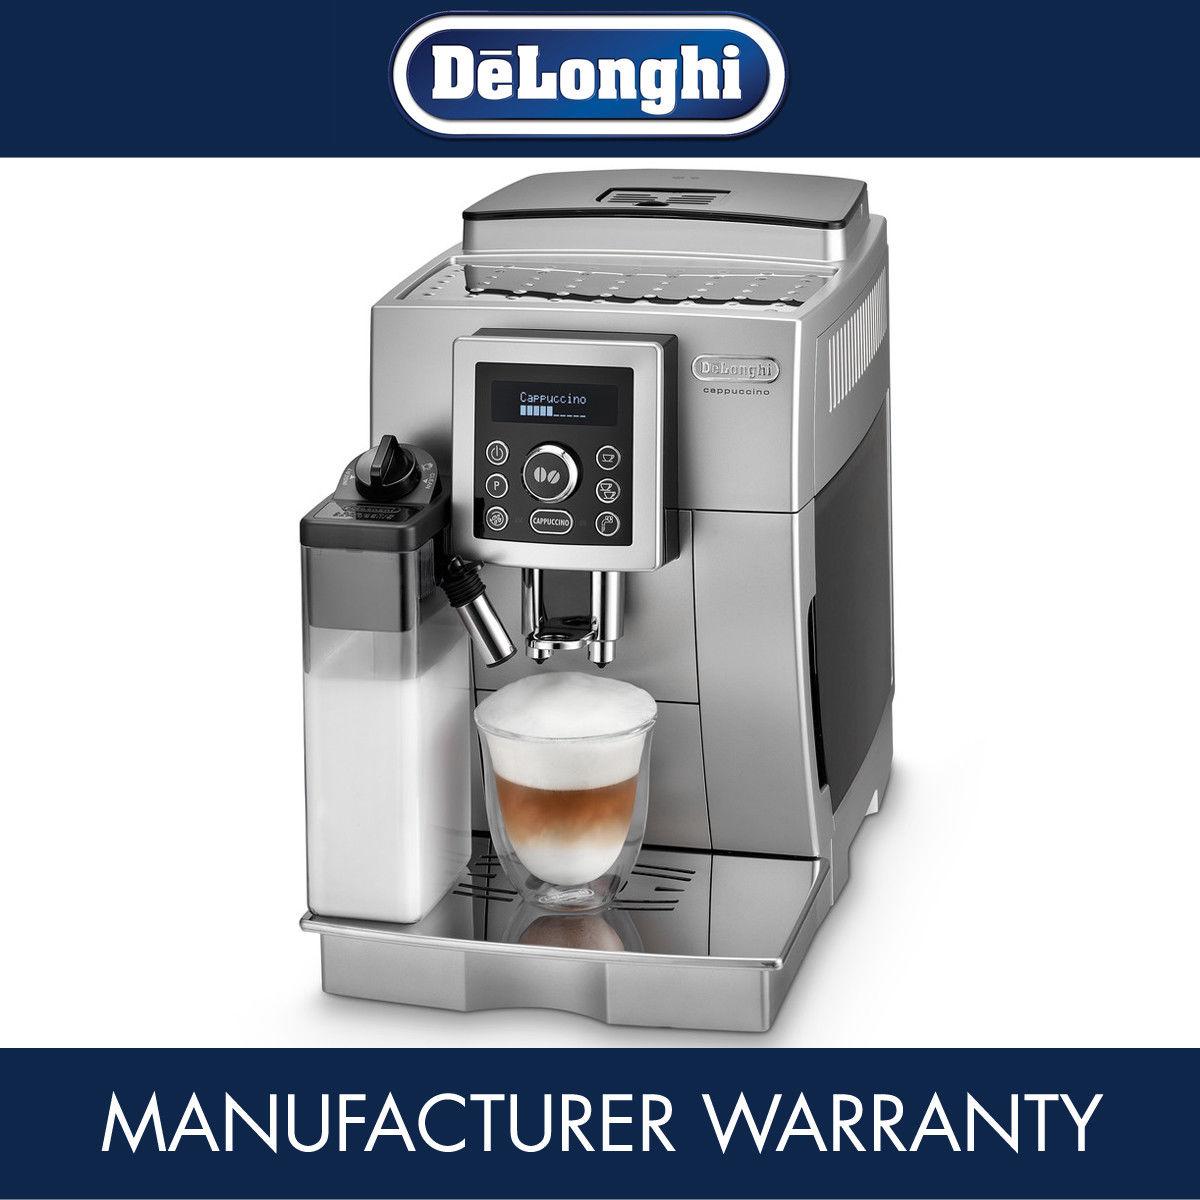 Refurbished - De'Longhi ECAM23.460.S Bean to Cup Coffee Machine £223.99 Delivered @ delonghiuk / eBay